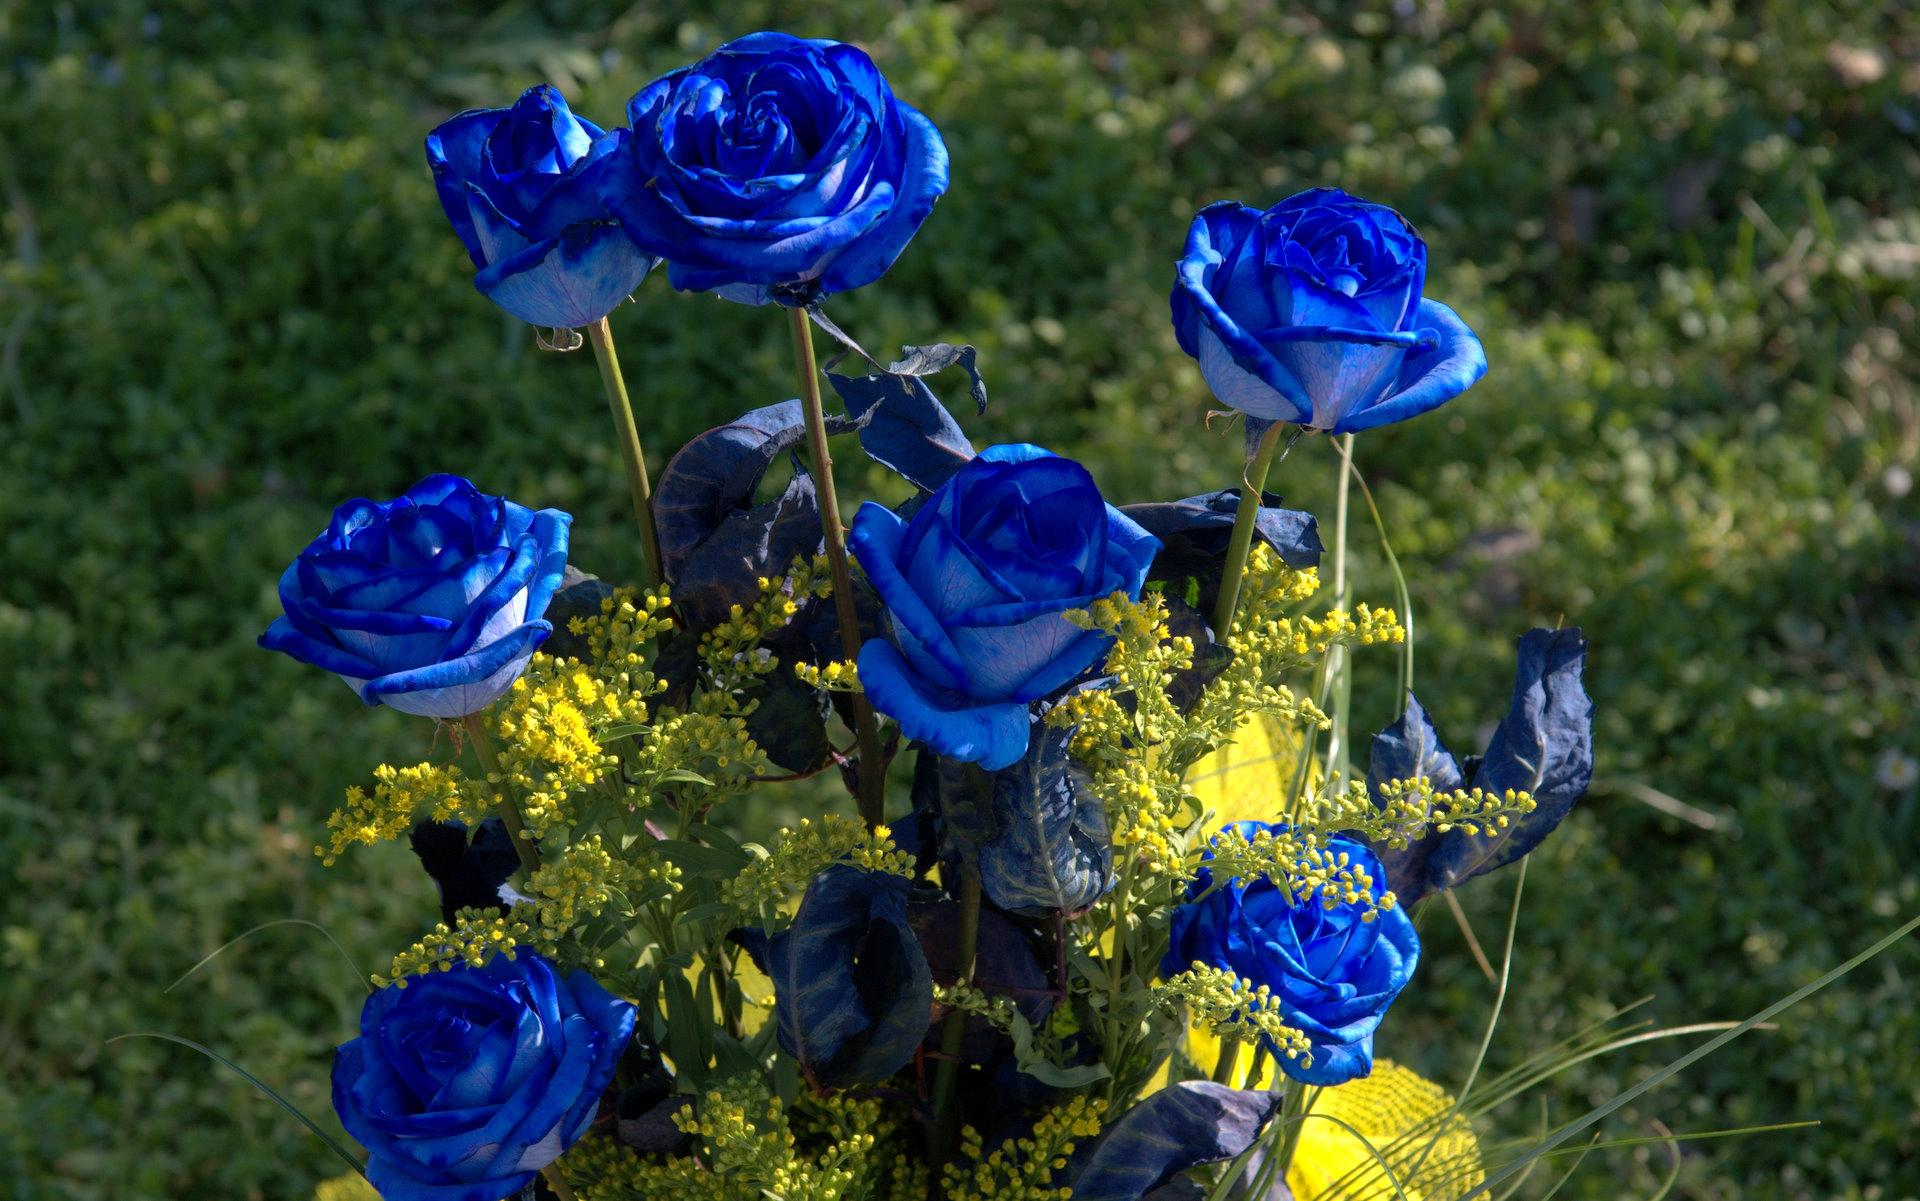 Blue Rose Flower Images 1 High Resolution Wallpaper